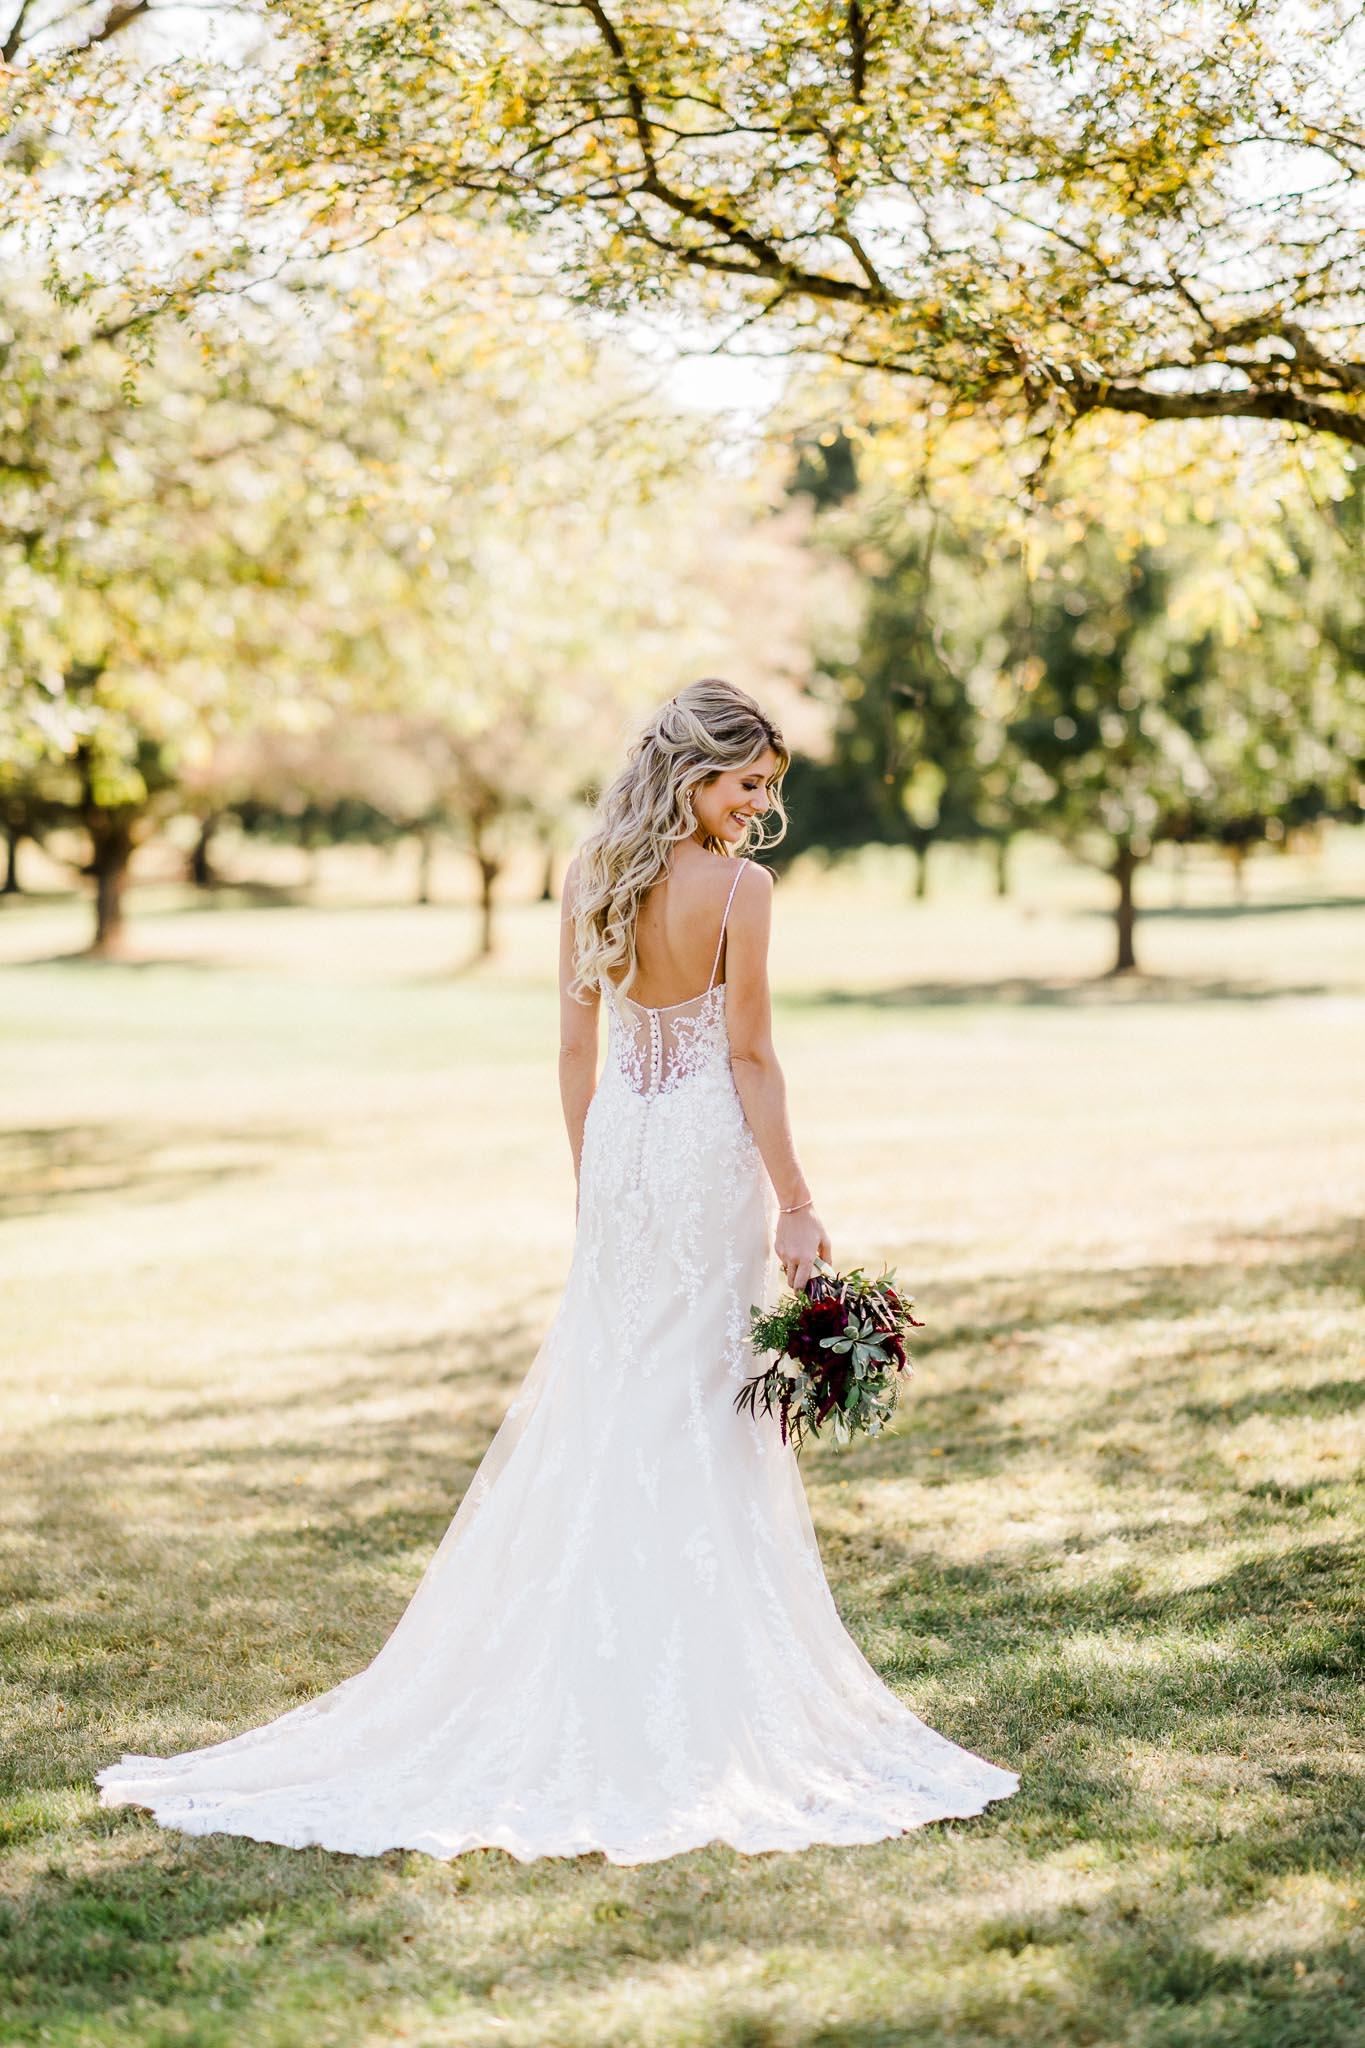 Frosty-Valley-September-Wedding-7605.jpg